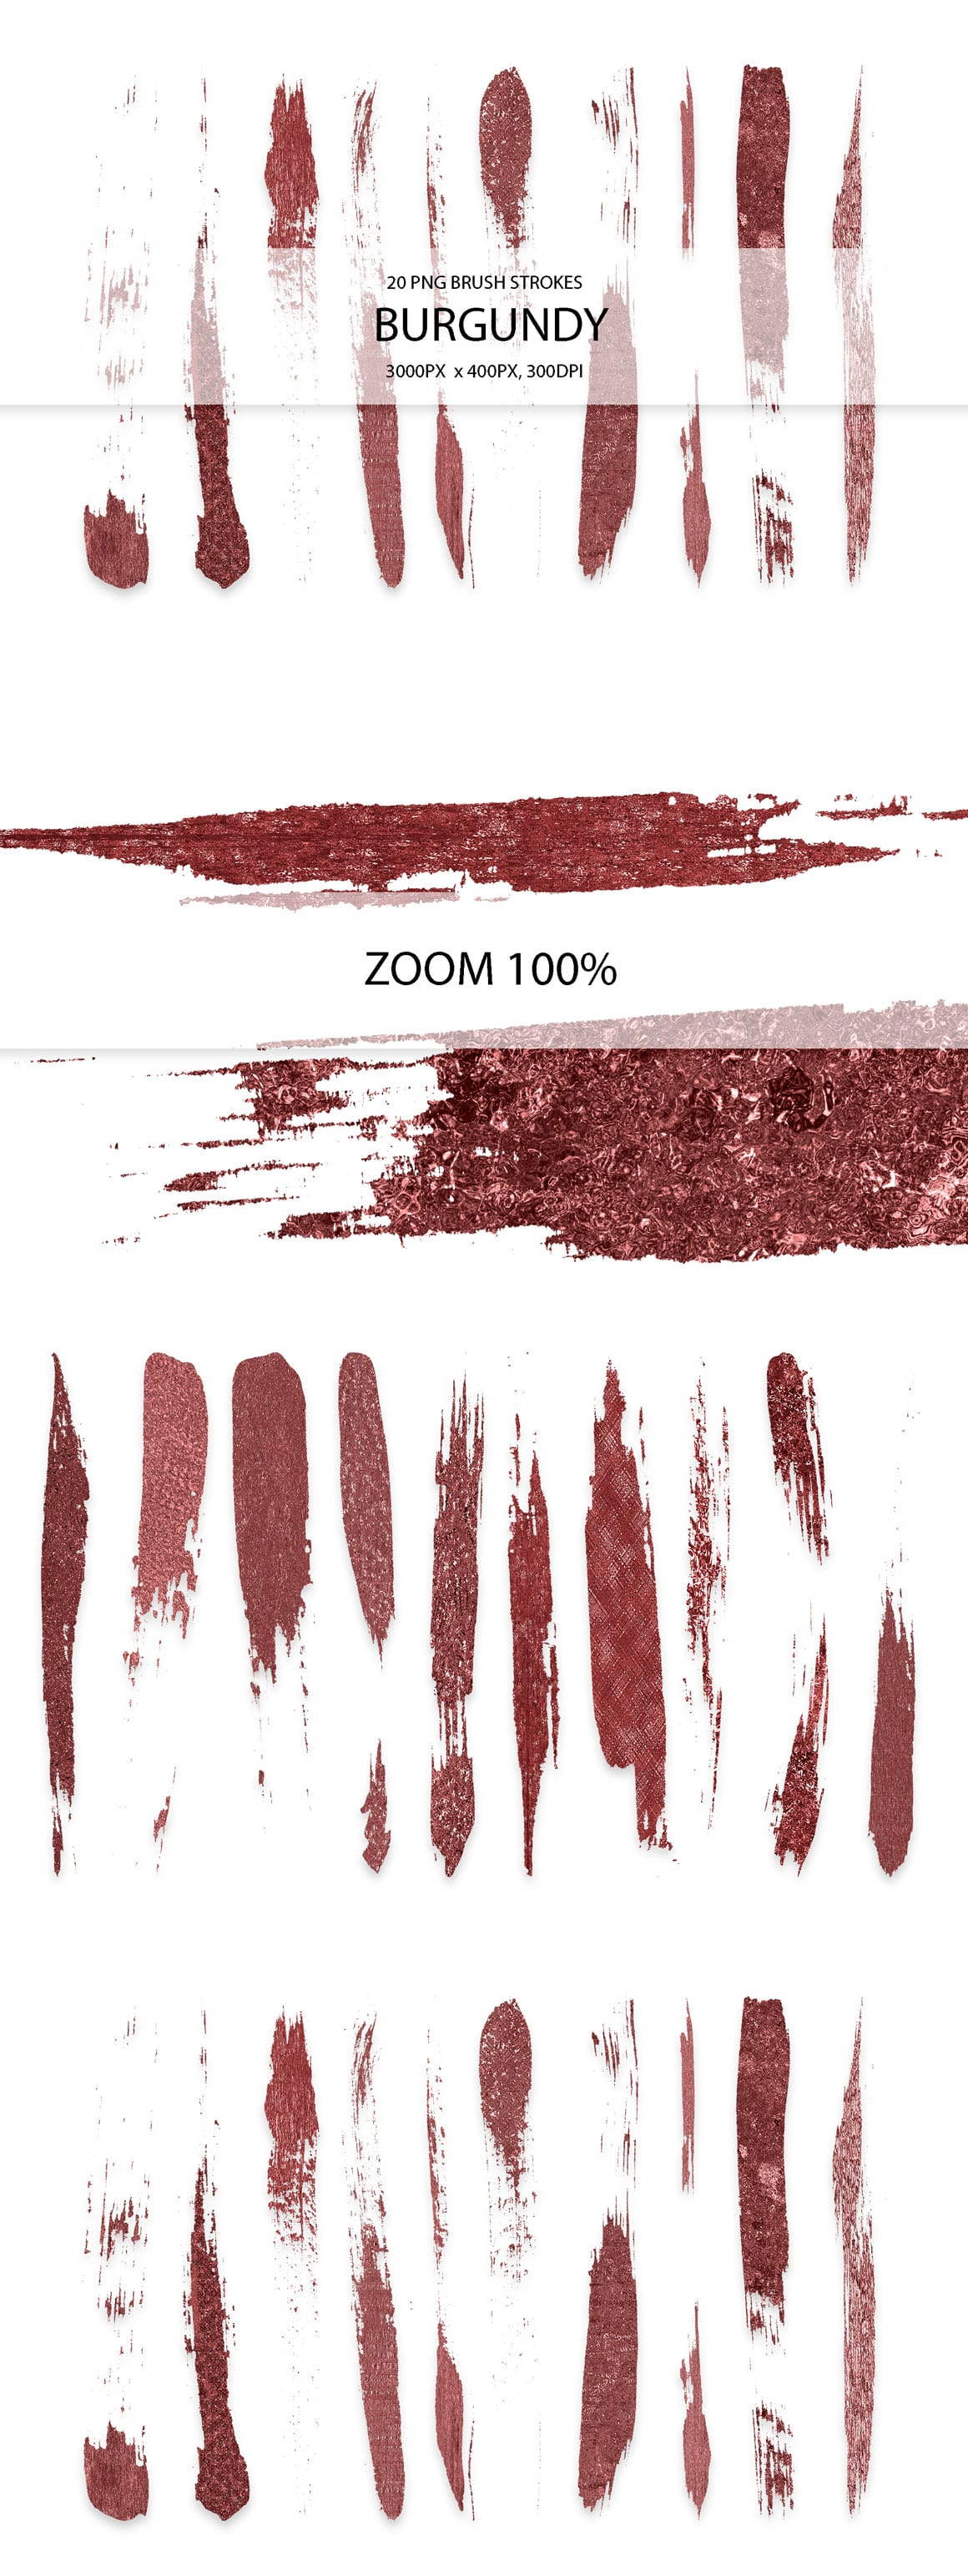 829 Acrylic Brush Strokes and Digital Brush Strokes - $9 - BurgundyStrokes 01 min